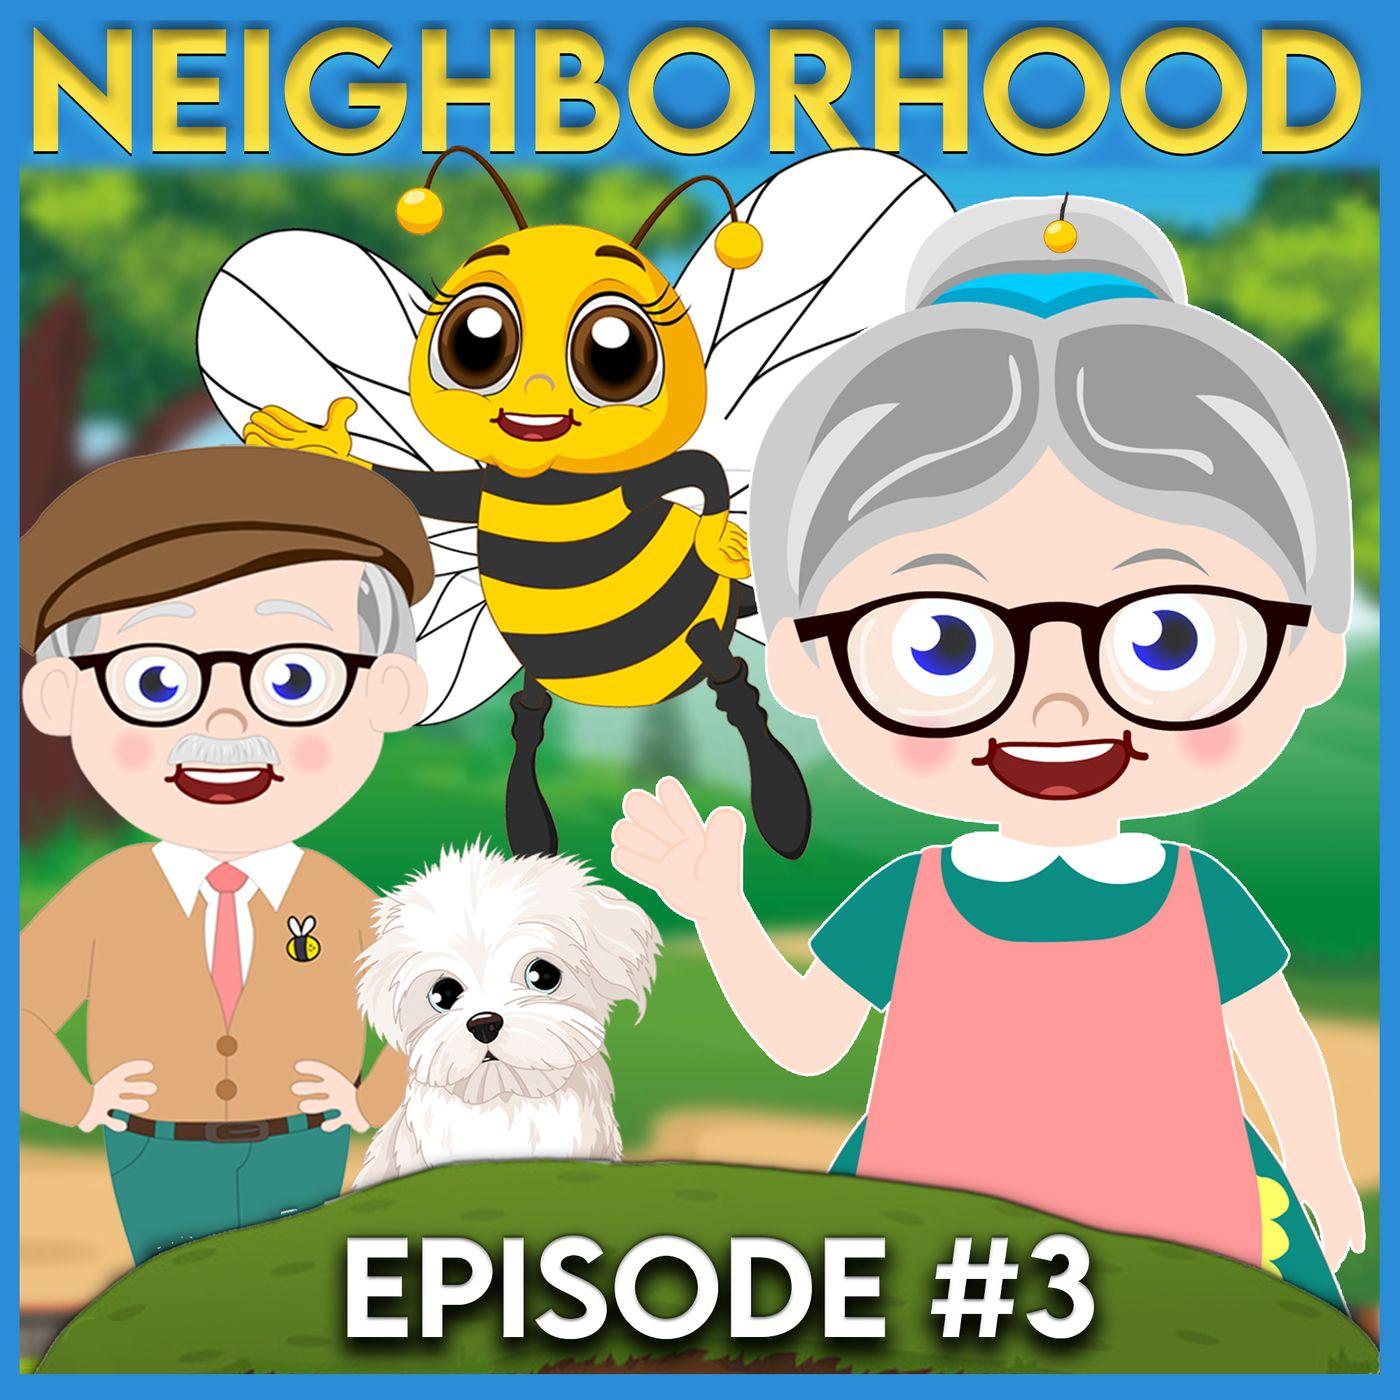 Mrs. Honeybee's Neighborhood - Episode 3